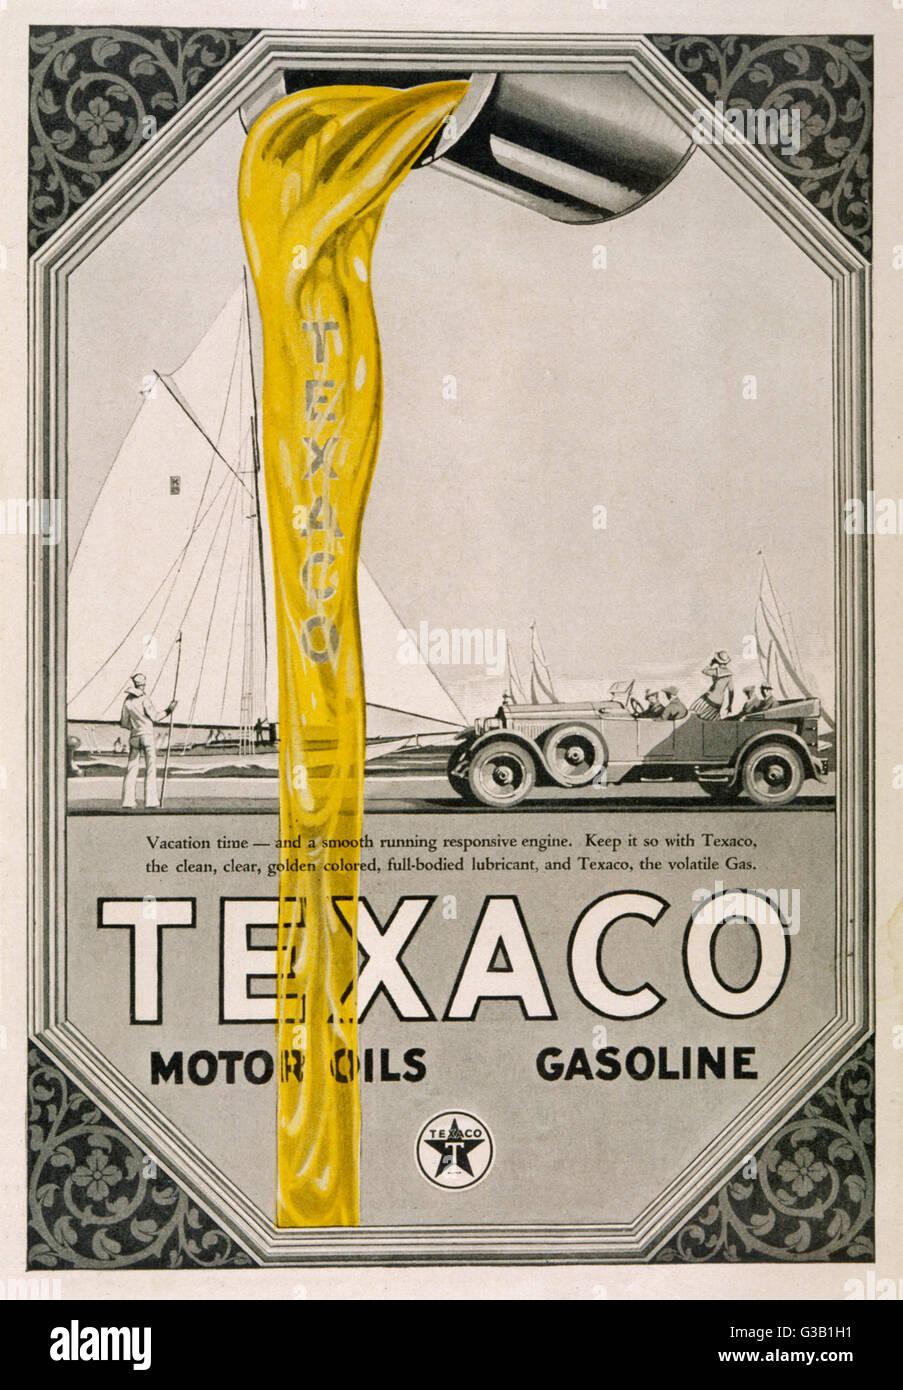 Texaco motor oils and gasoline        Date: 1904 Stock Photo